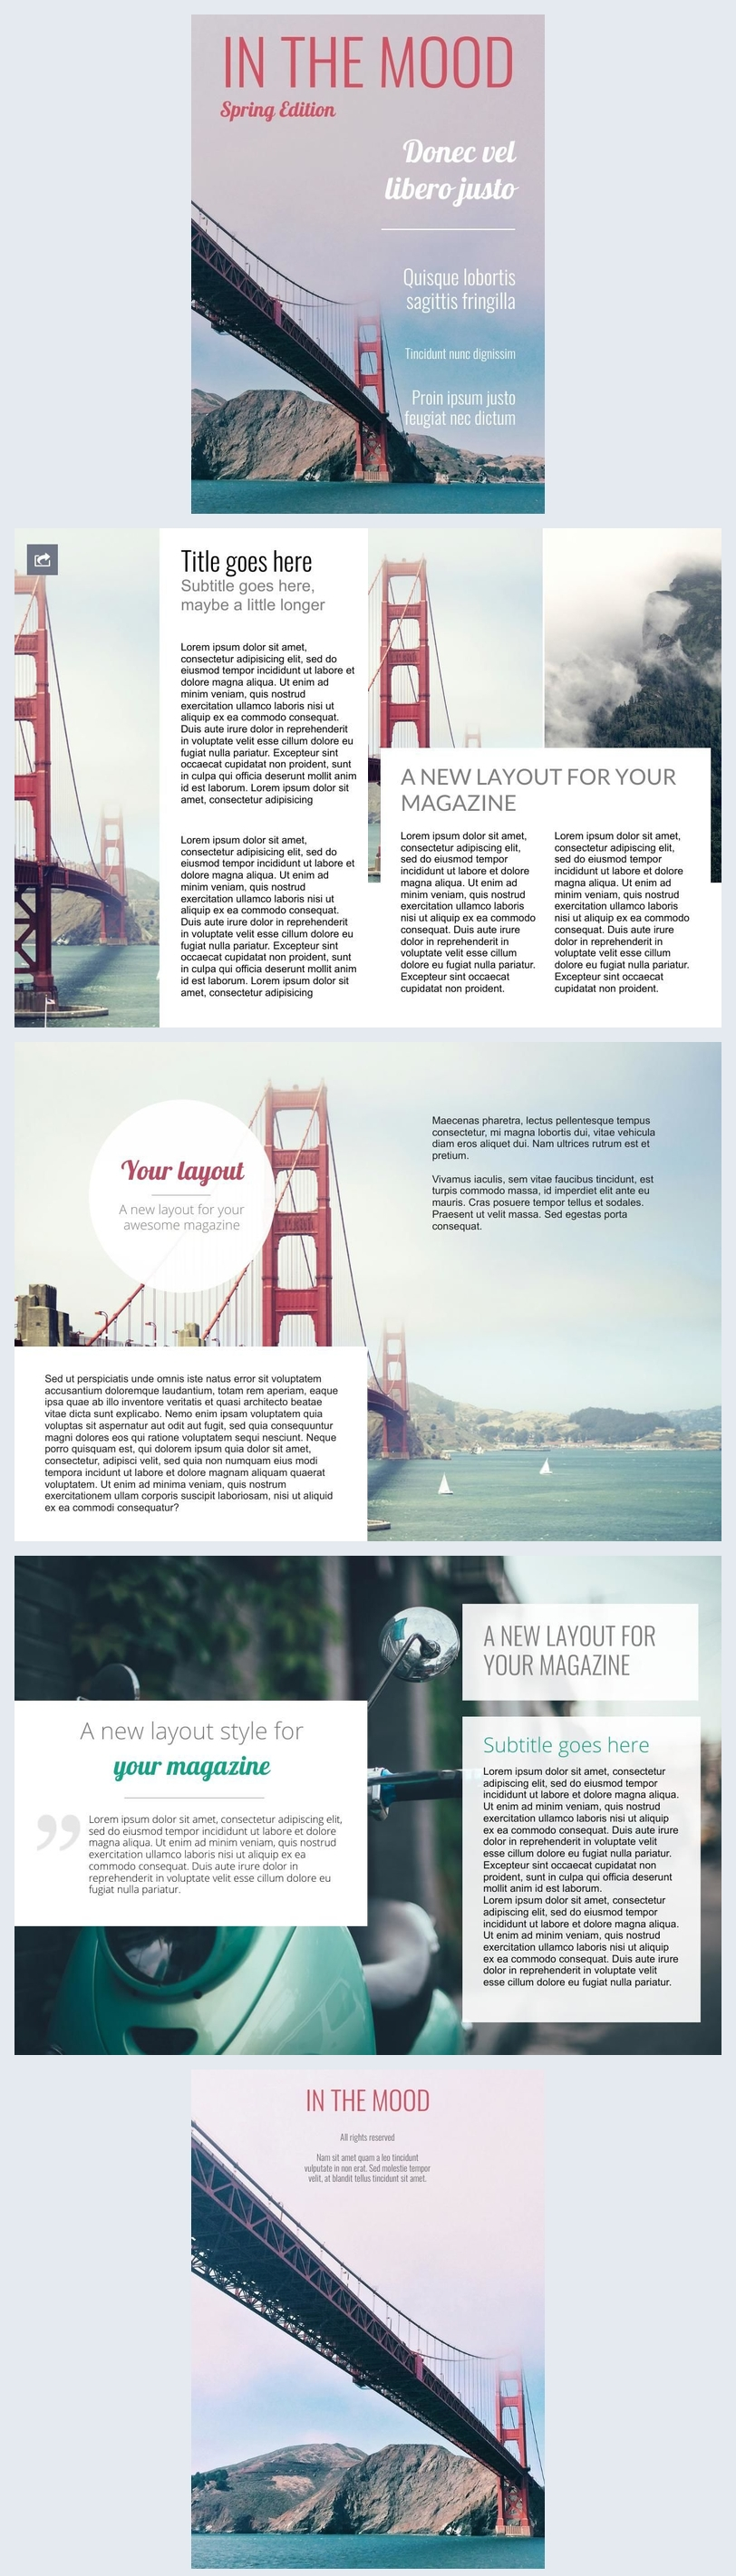 Travel & Photography Magazine Design